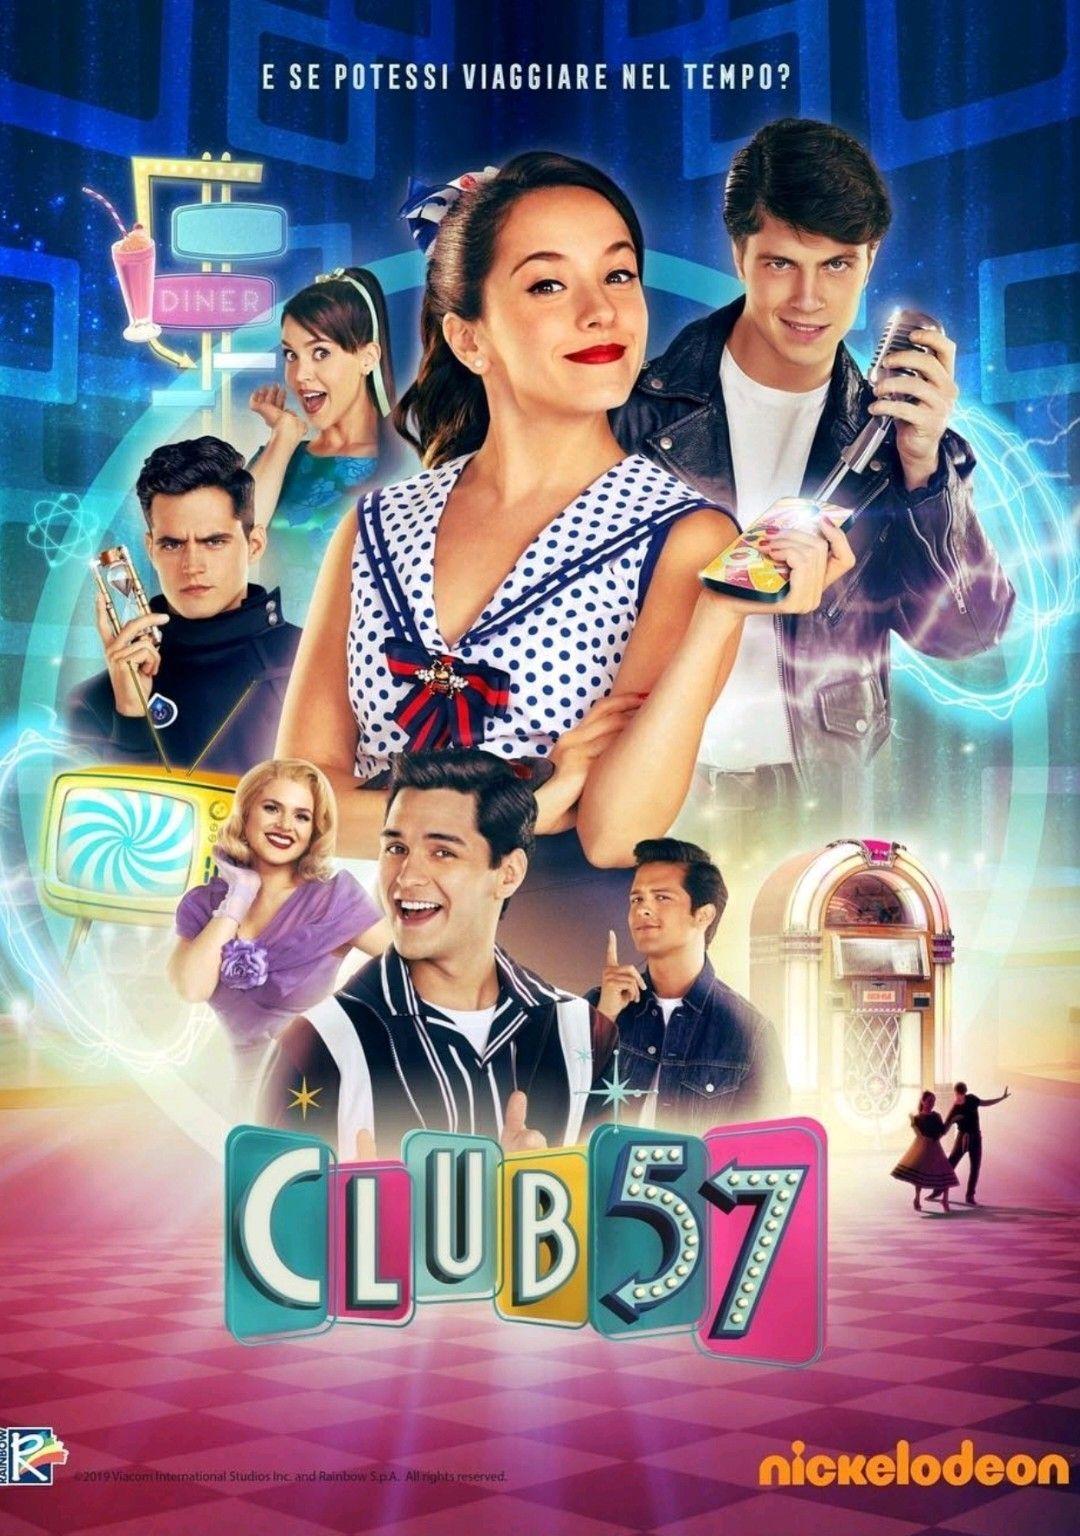 Club 57 Netflix : netflix, Italo, Netflix, Filmes, Series,, Series, Filmes,, Fotos, Cantores